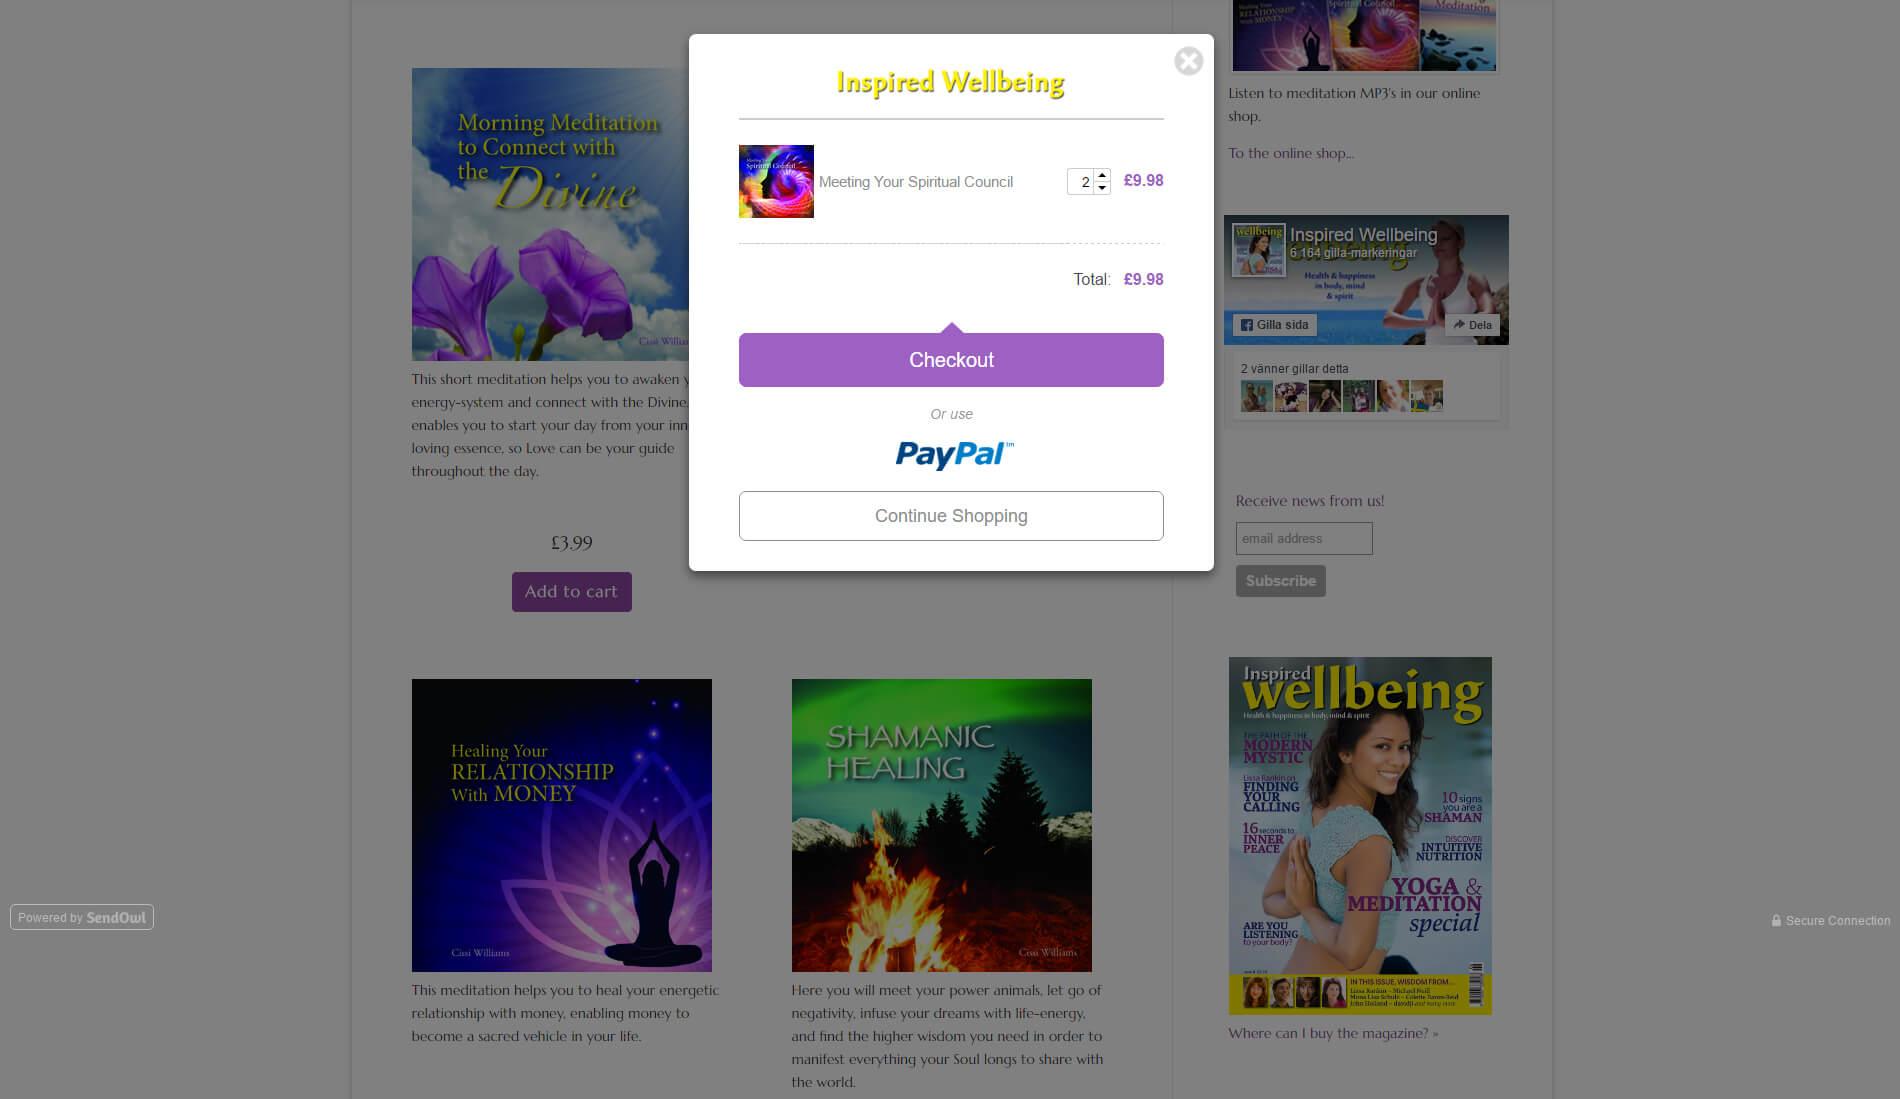 anweb Webbdesign Webbshop Inspired Wellbeing